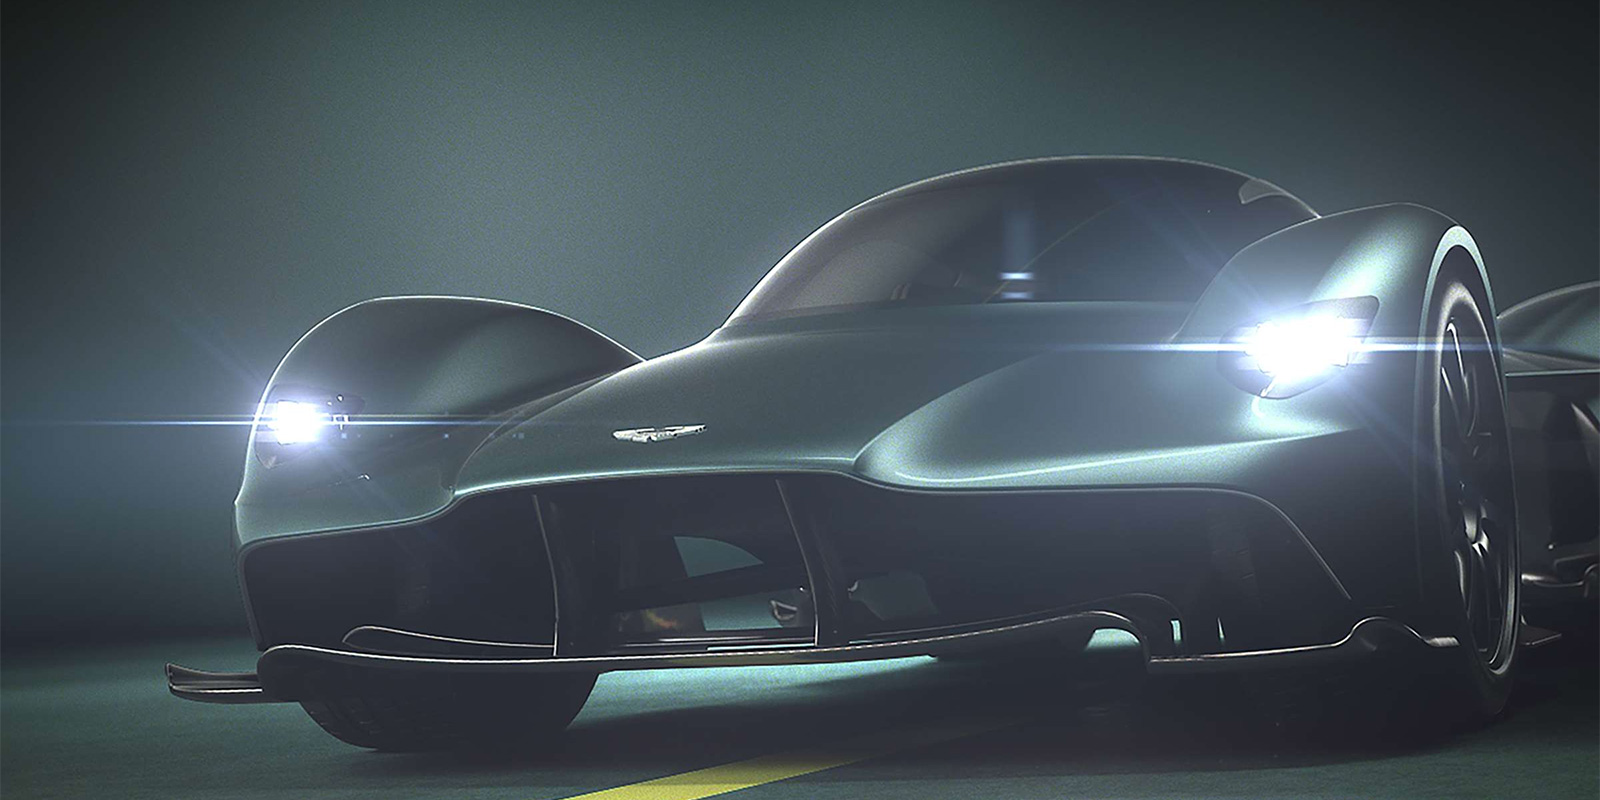 Aston Martin Valkyrie - Otherworldly Performance